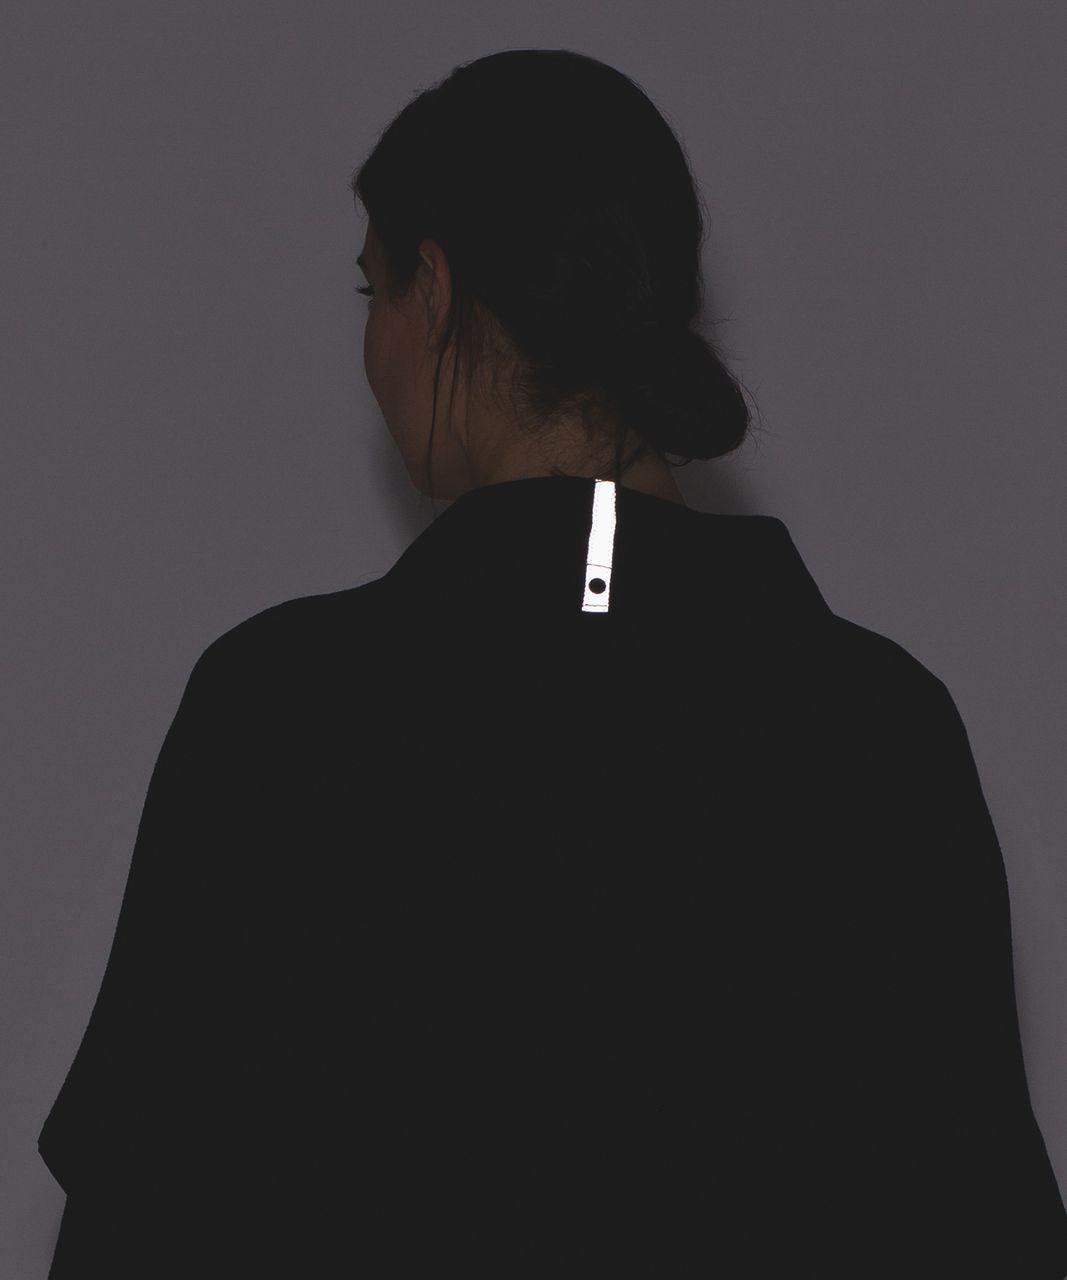 Lululemon Vinyasa Wrap - Running Luon Spray Jacquard Black Cherry Black / Black